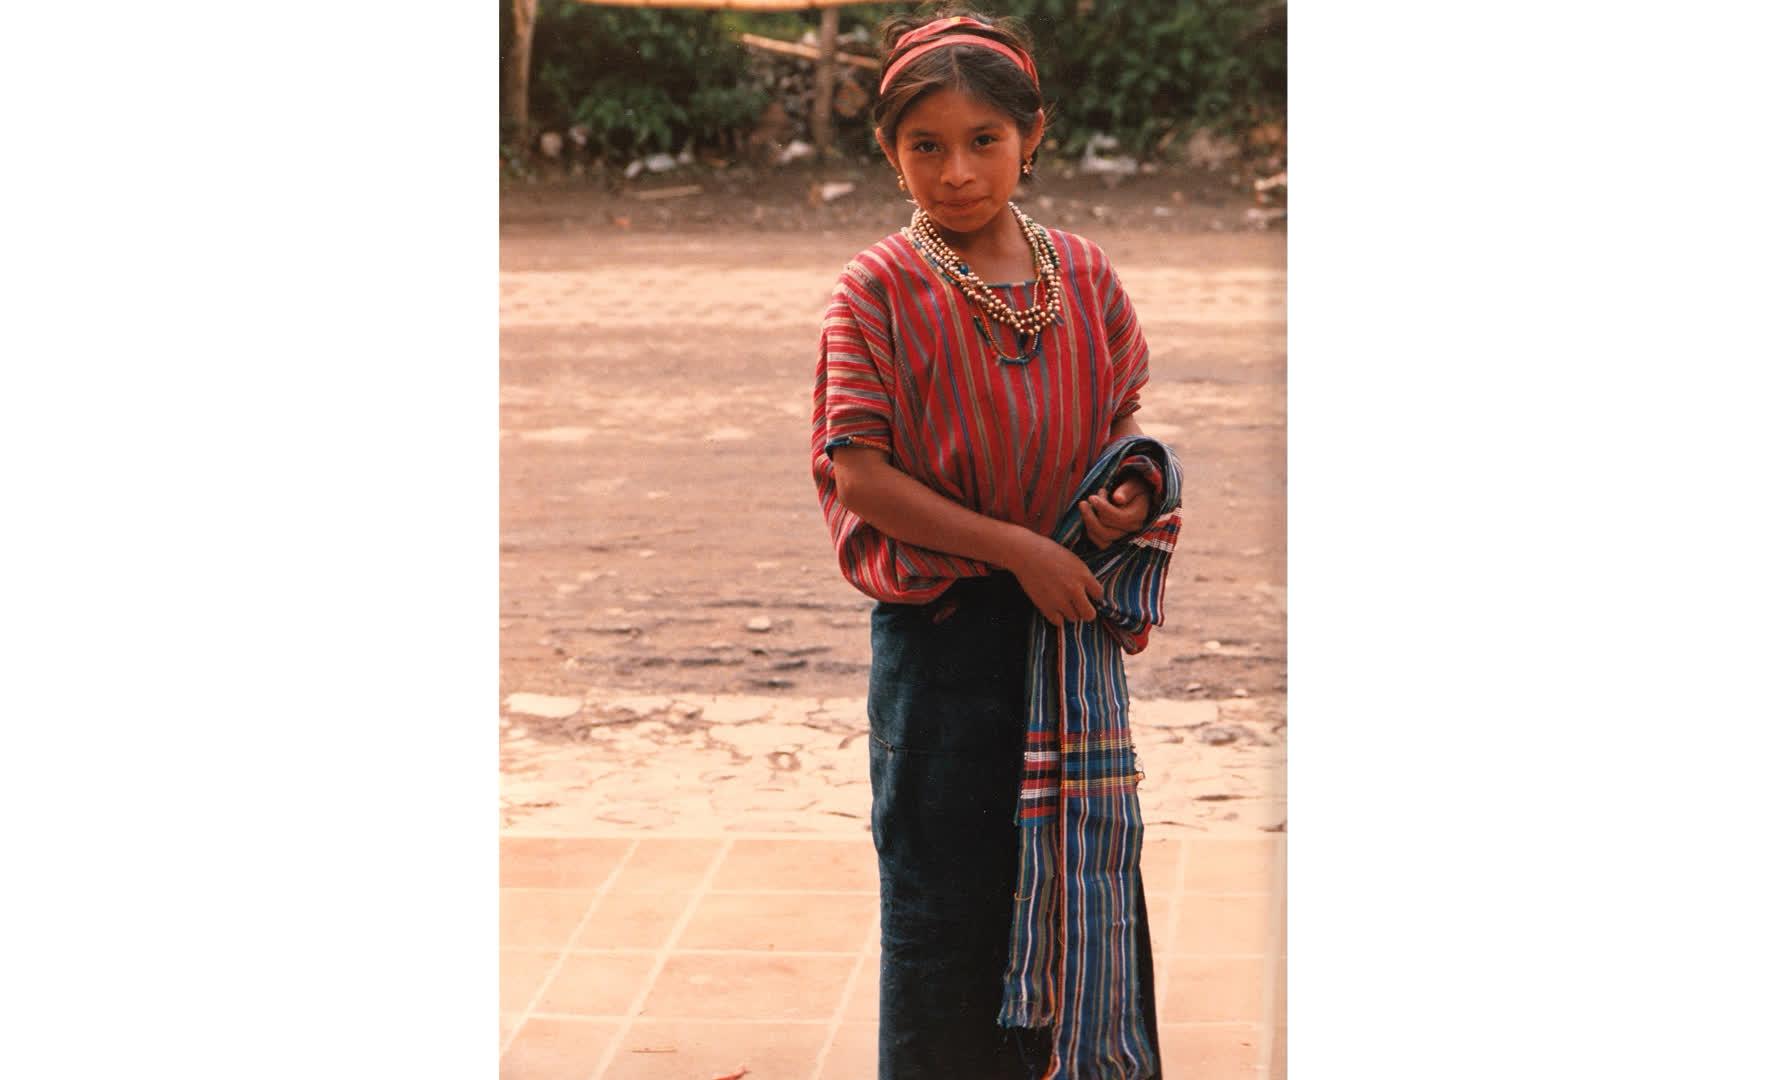 Woman of Guatemala in Ikat clothing